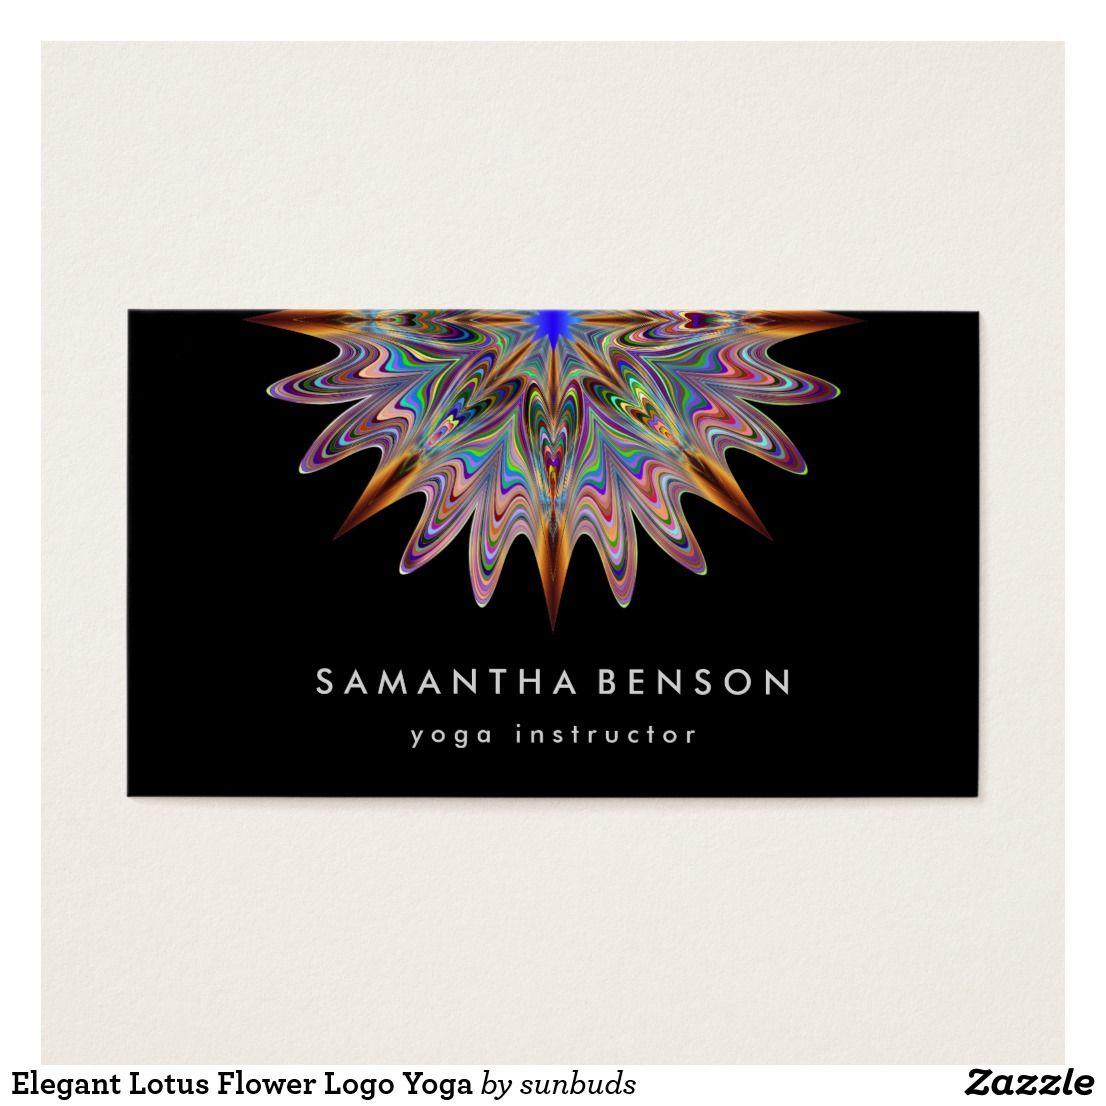 Elegant Lotus Flower Logo Yoga Business Card | Yoga